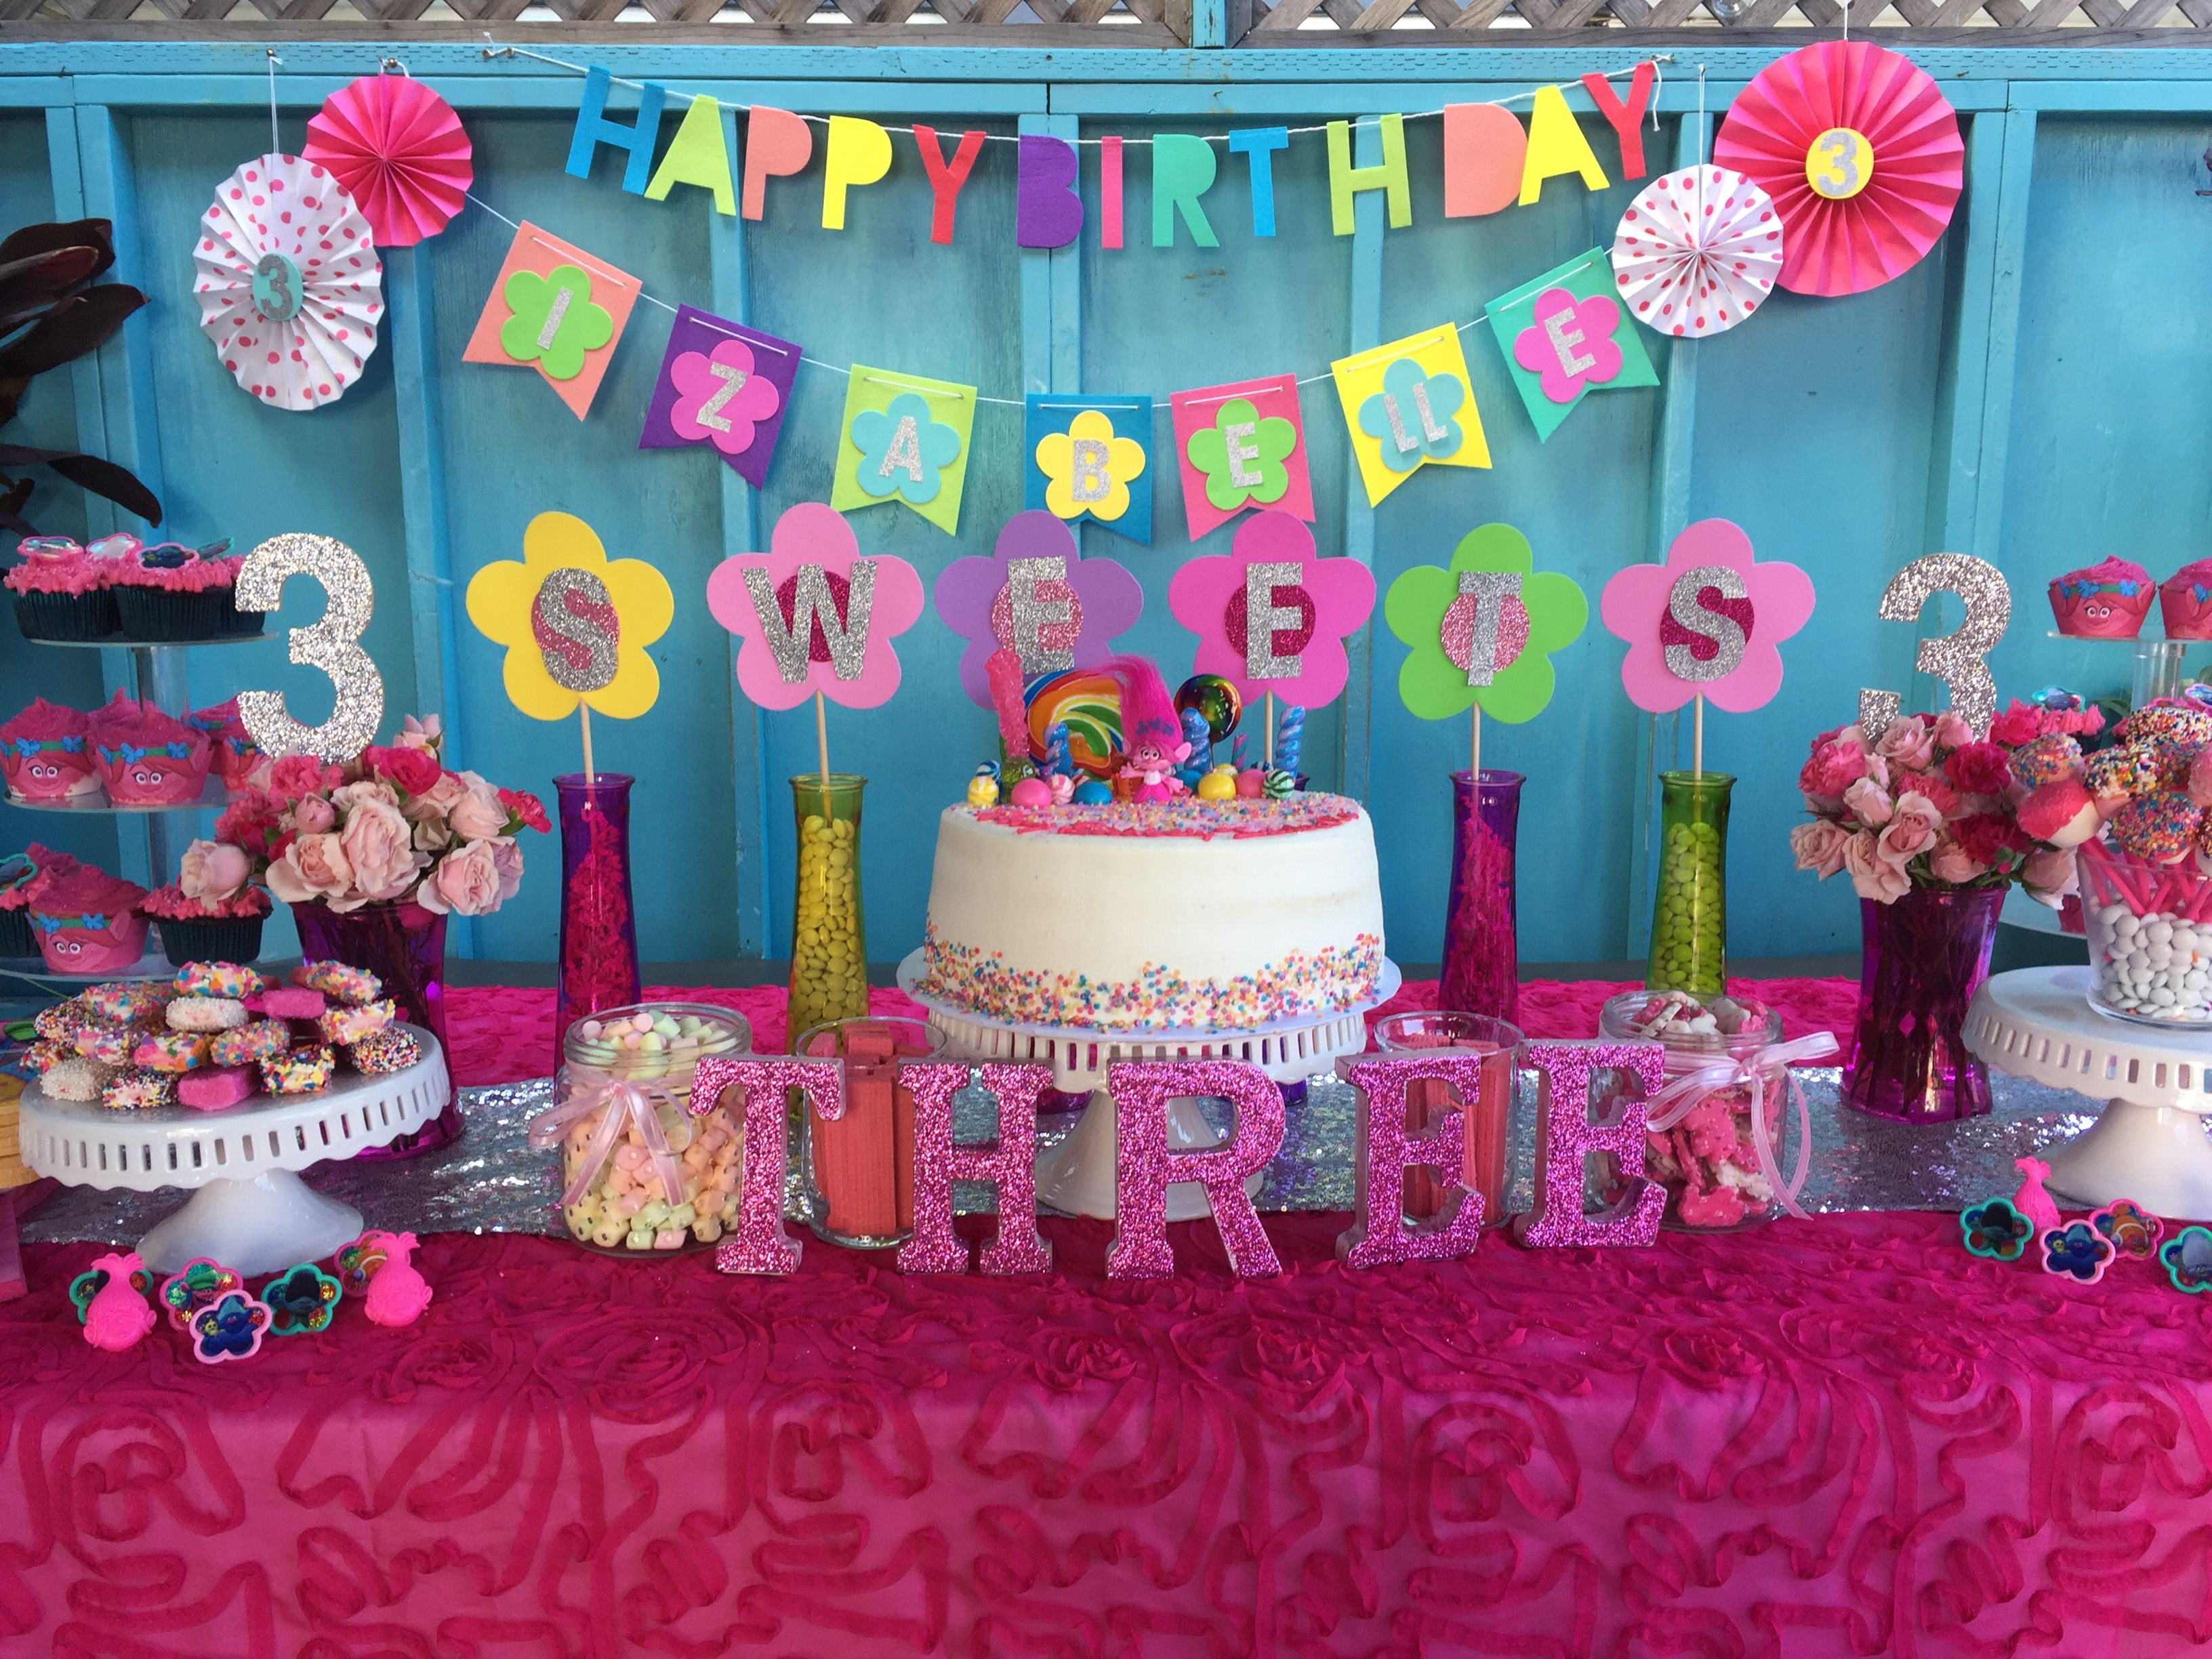 Trolls Princess Poppy Birthday Candy Cake Dessert Table Fall Birthday Birthday Candy Birthday Parties